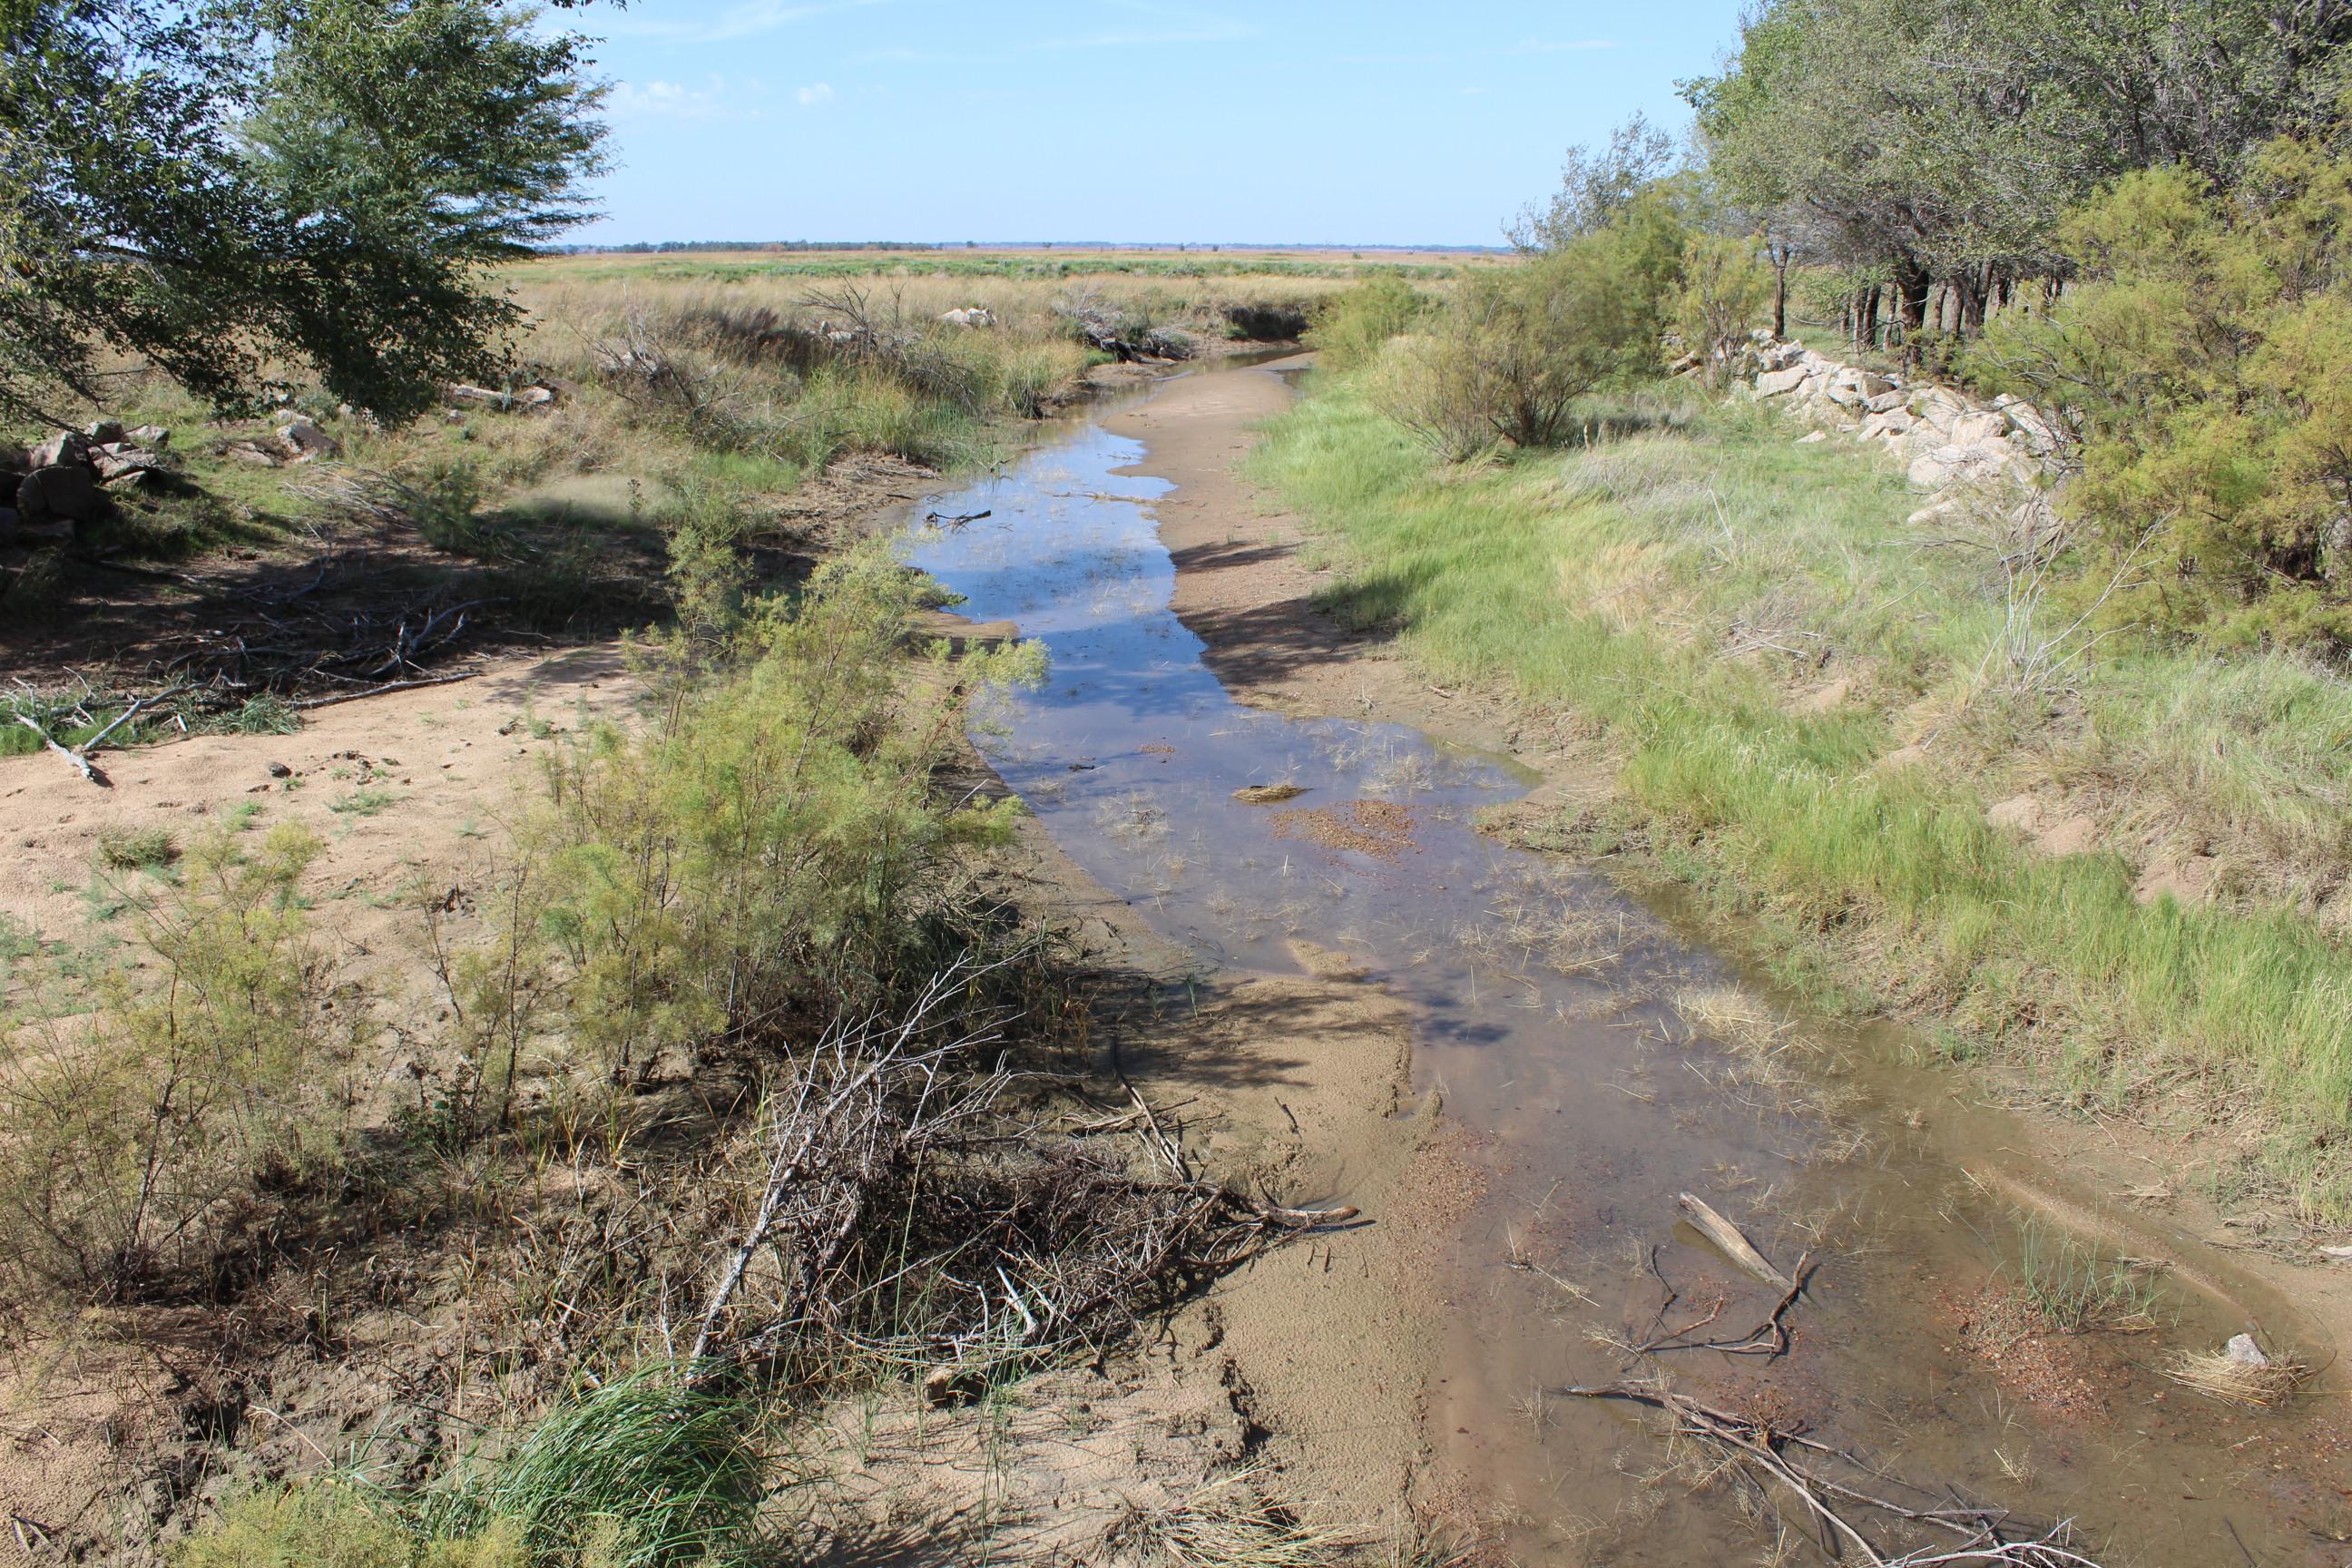 Rattlesnake Creek, near Quivira National Wildlife Refuge. (Photo by J. Schafer)